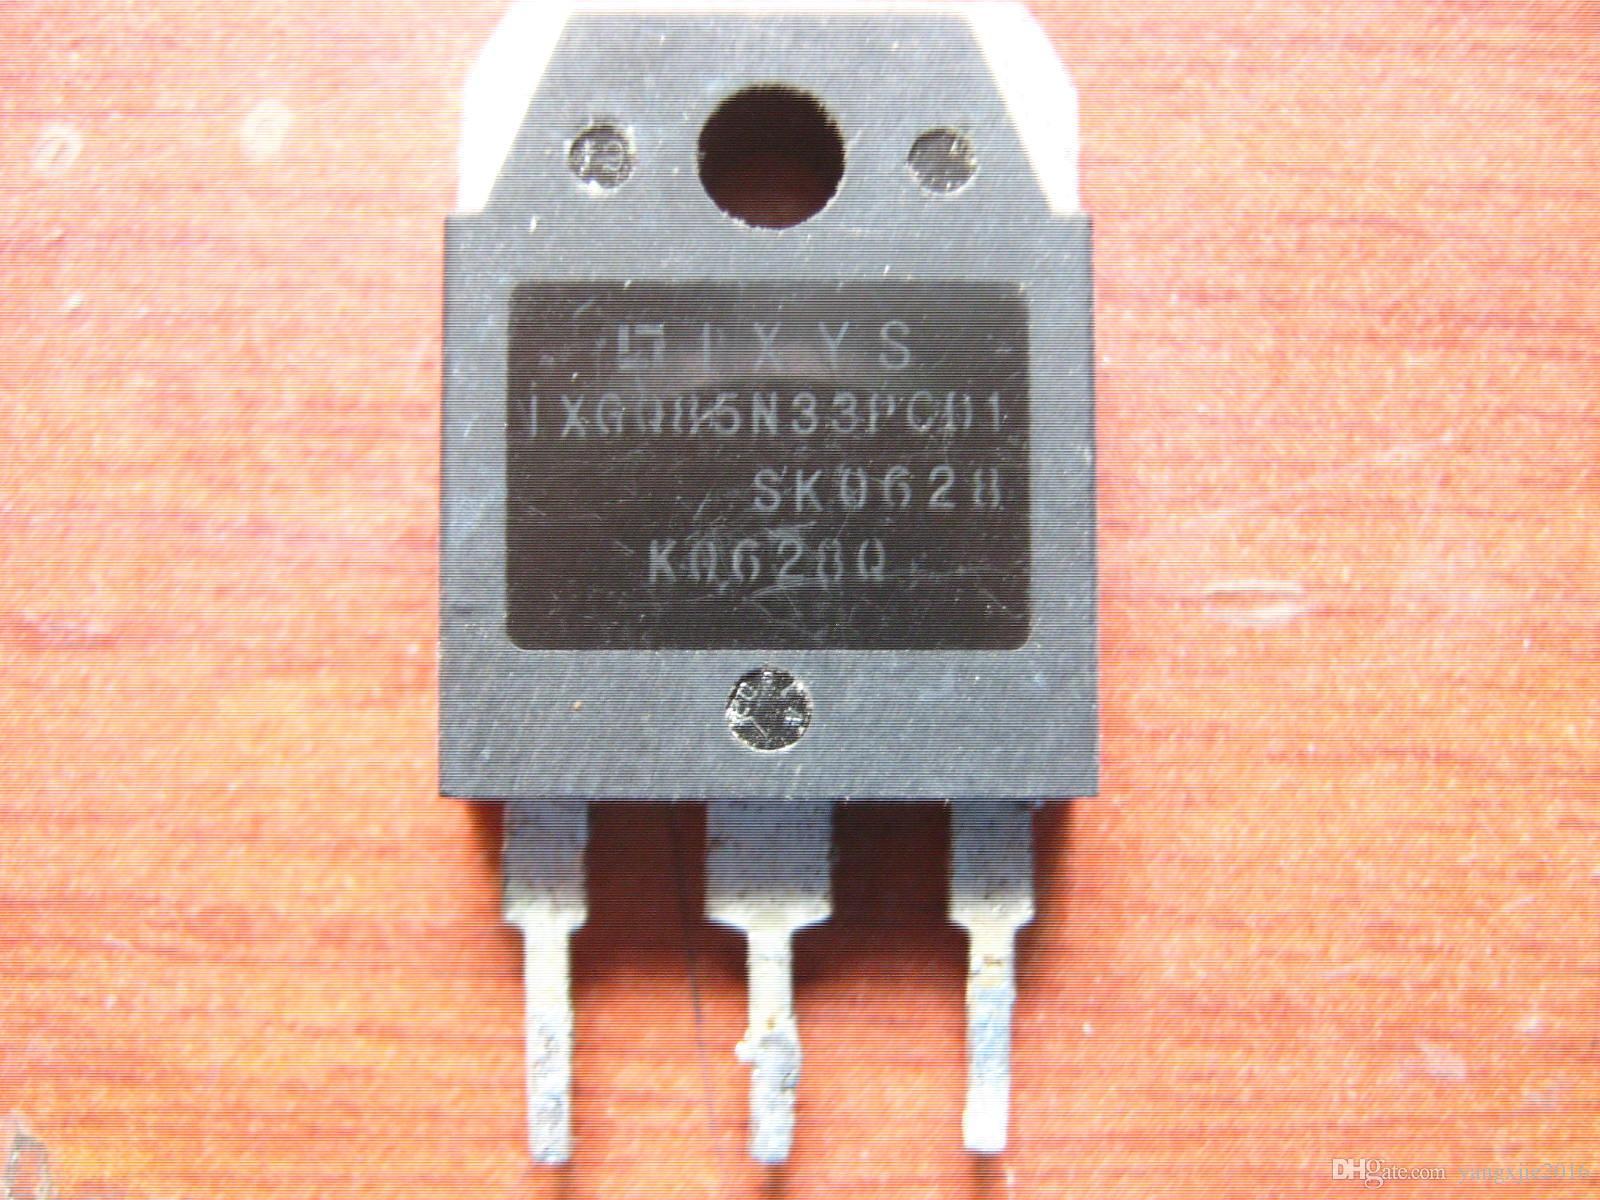 200 Widerstand 31,6KOhm CRB25 Metallfilm resistor 31,6K 0,25W TK50 1/% 853930